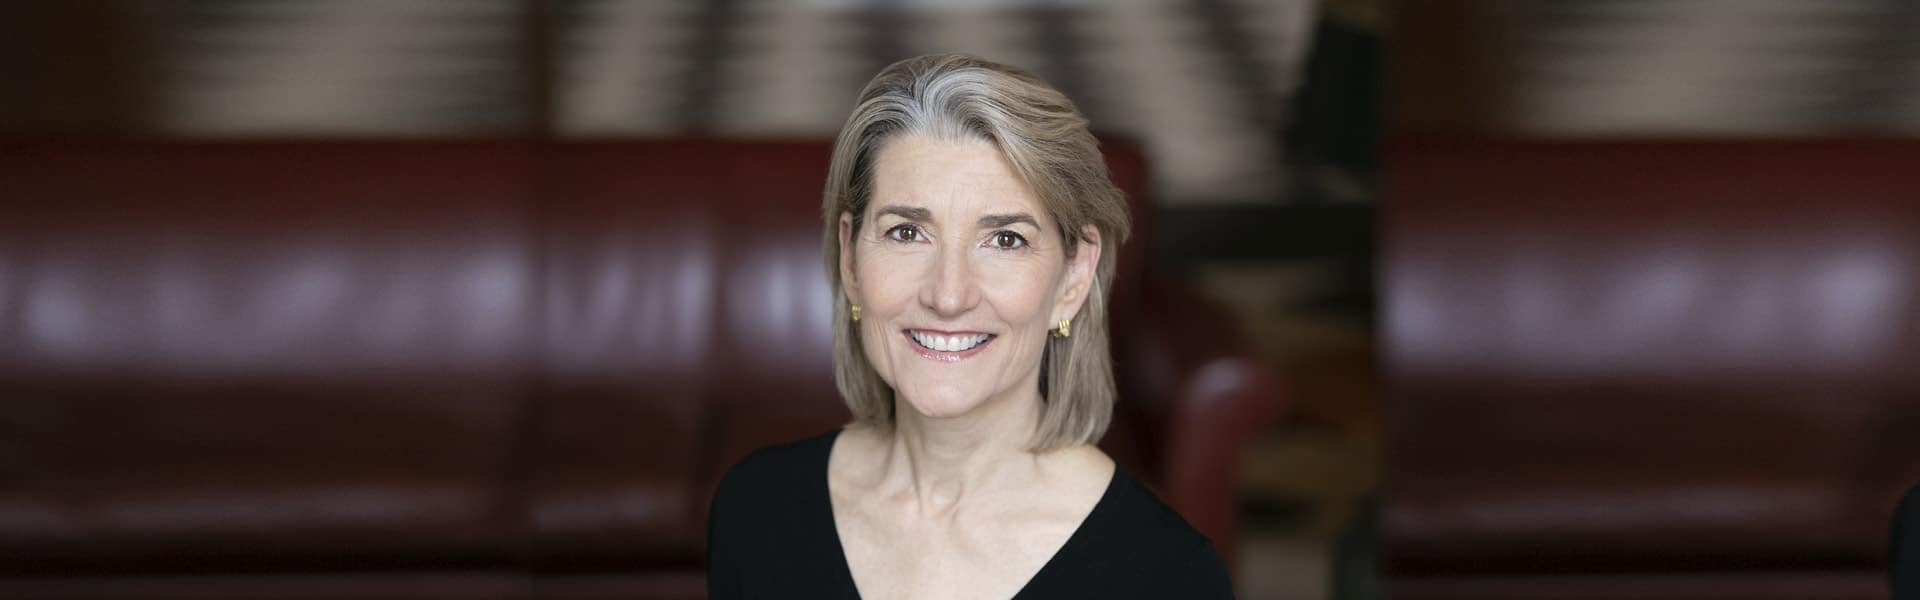 Amy C. Edmondson